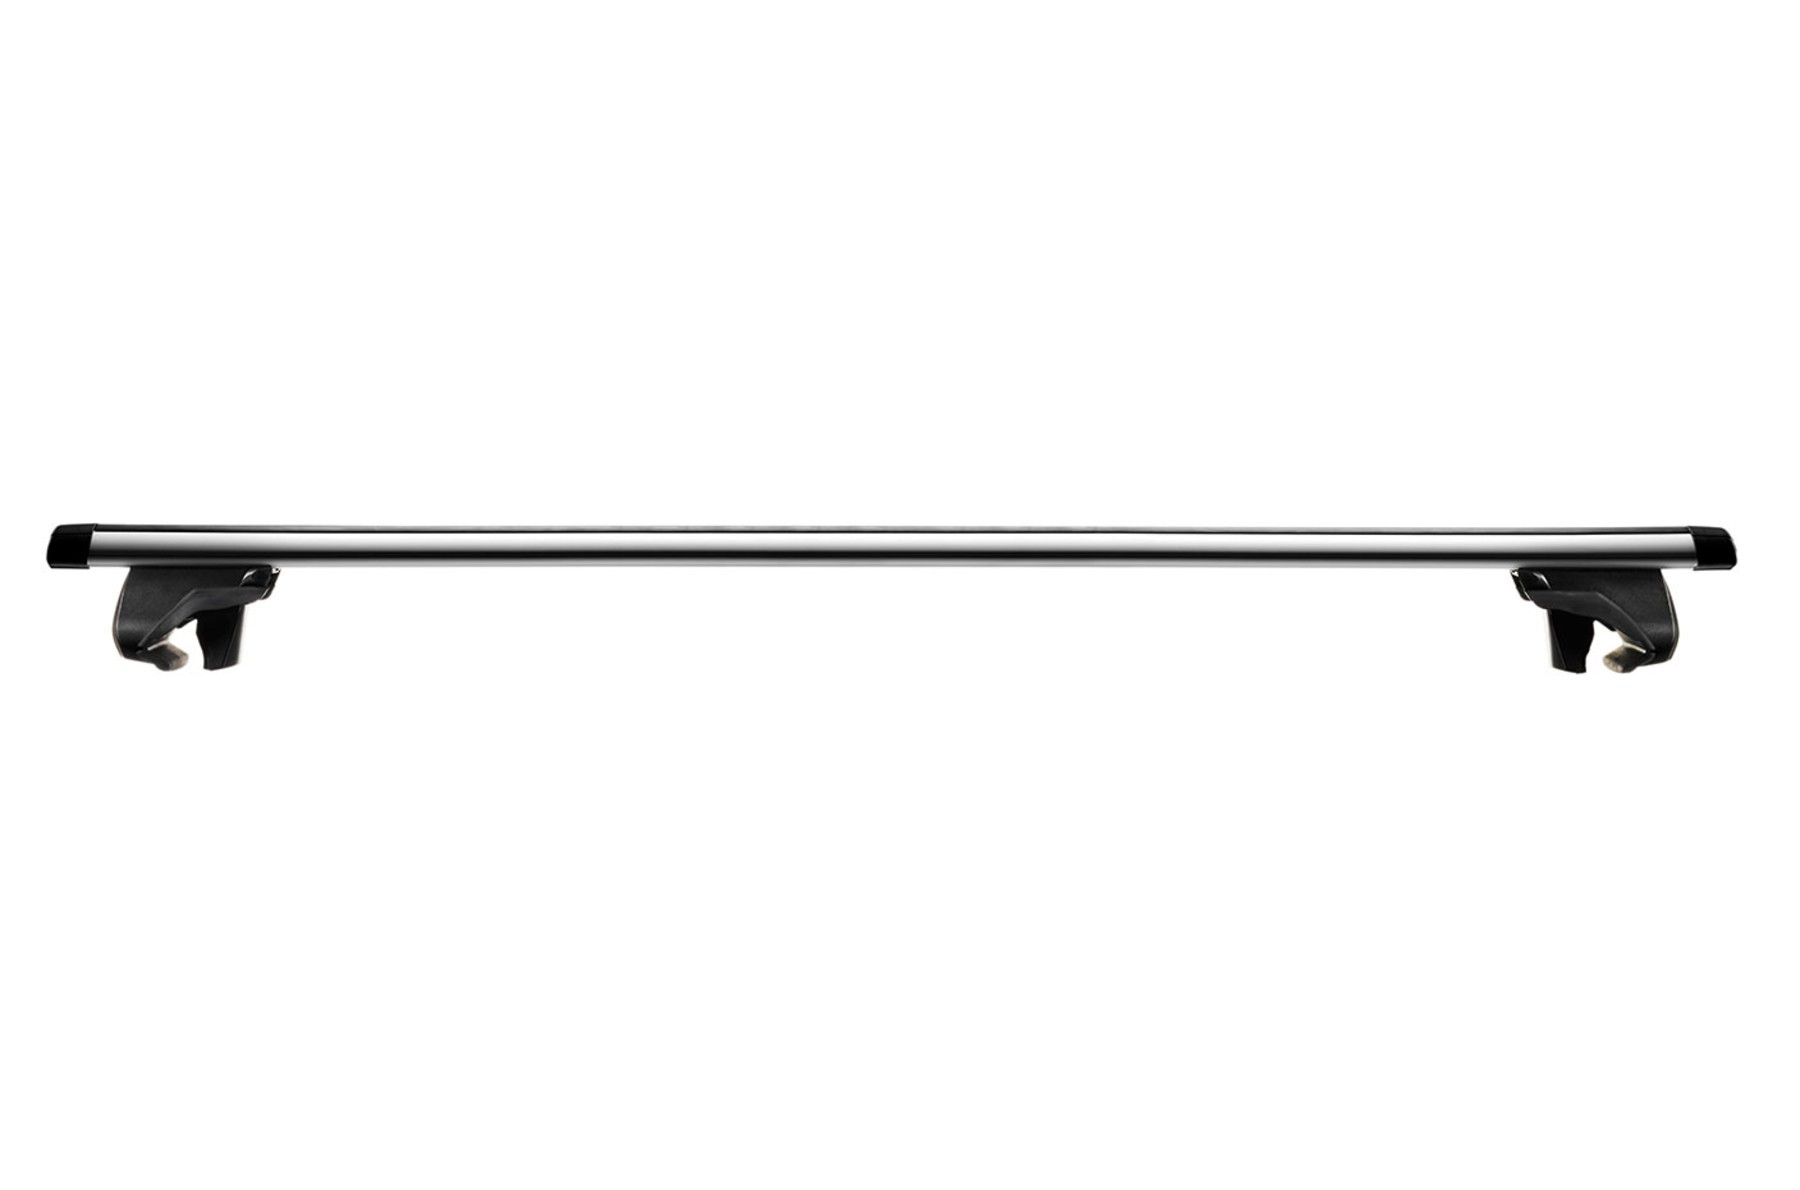 Rack Completo Thule Smart AeroBar 120cm p/ Longarina (794)